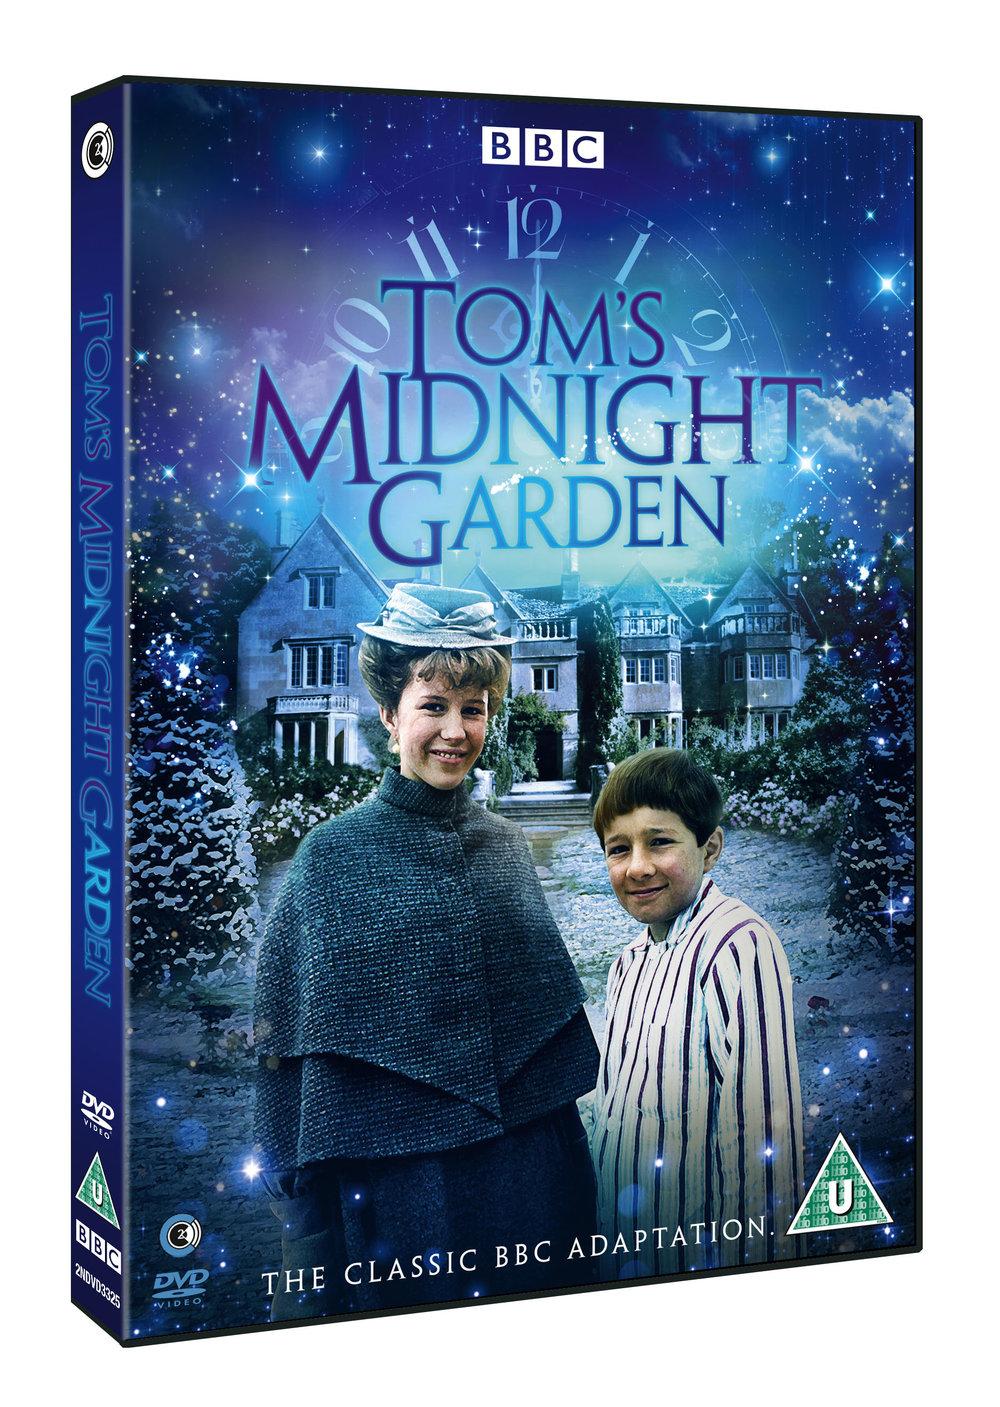 TOMS_MIDNIGHT_GARDEN_3D_DVD_PACKSHOT.jpg